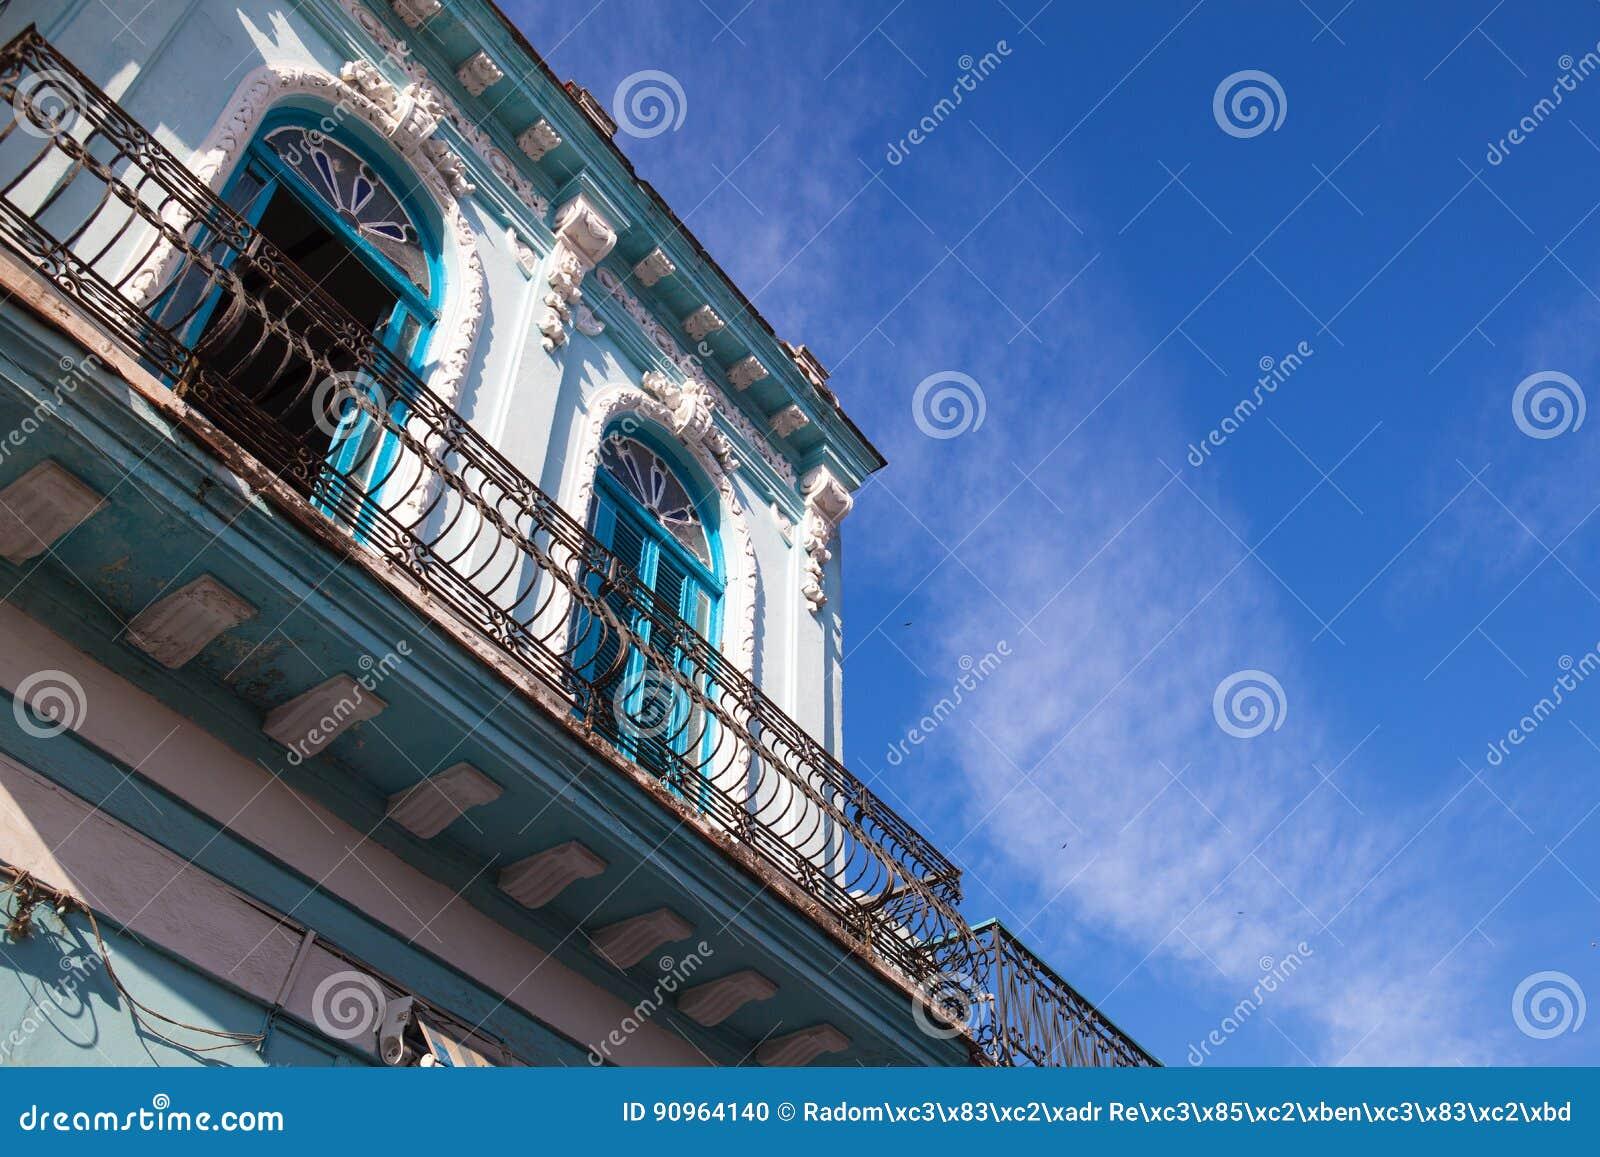 Architettura coloniale classica a Avana, Cuba